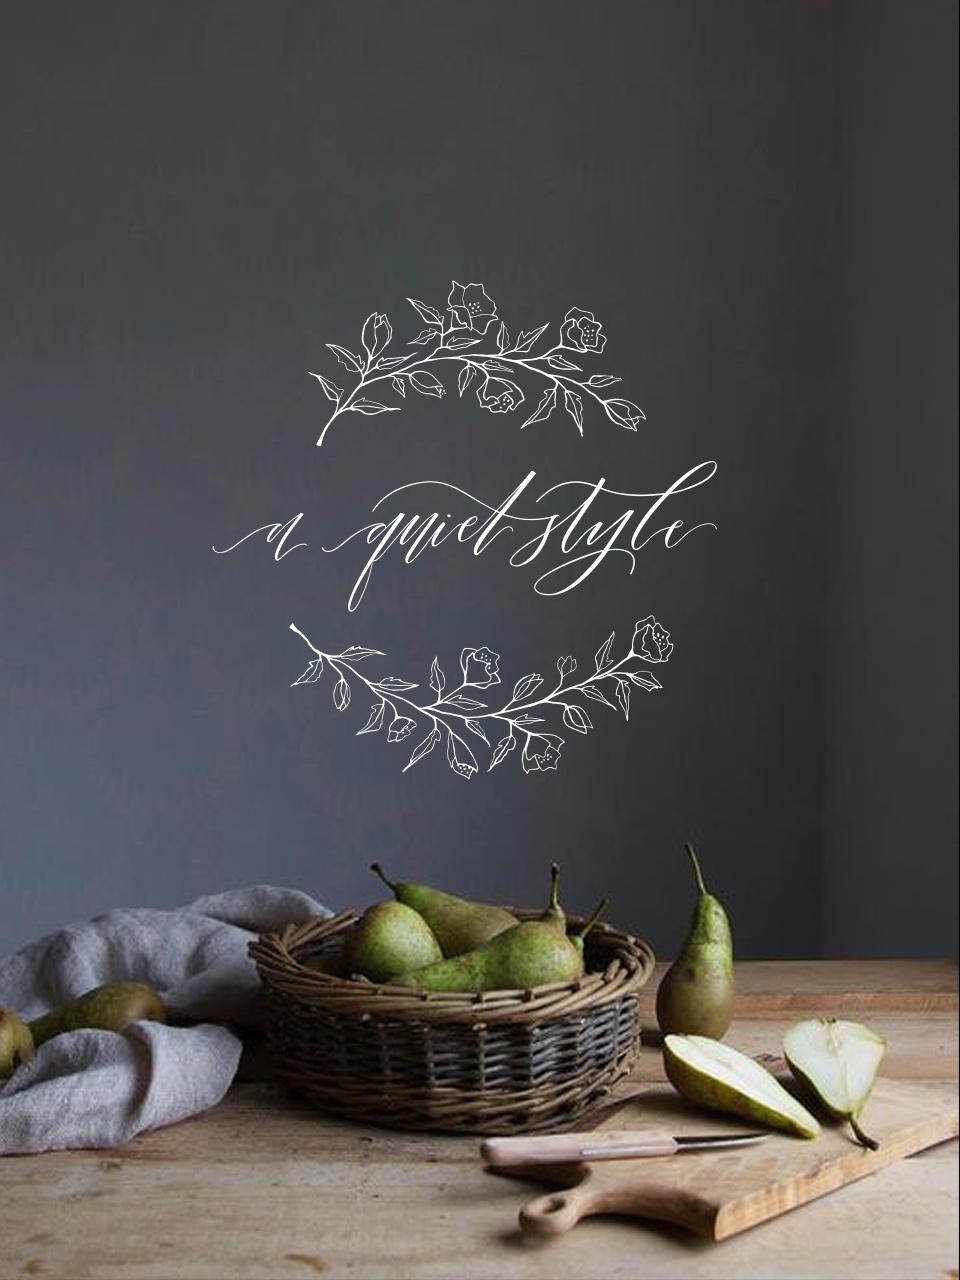 modern-calligraphy-bespoke-branding-a-quiet-style.jpg